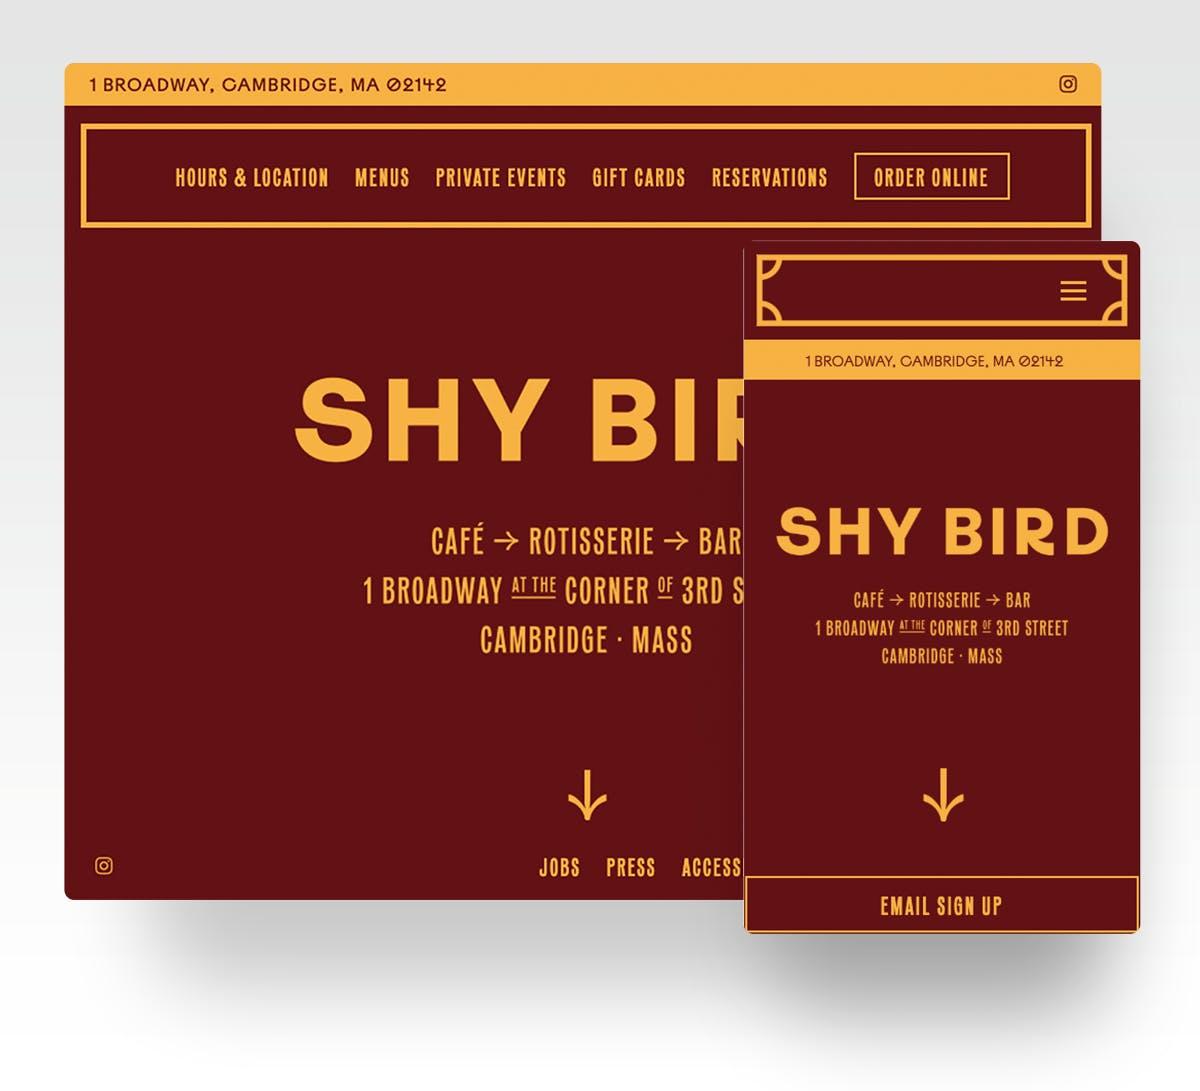 A screenshot of Shy Bird's restaurant website homepage.